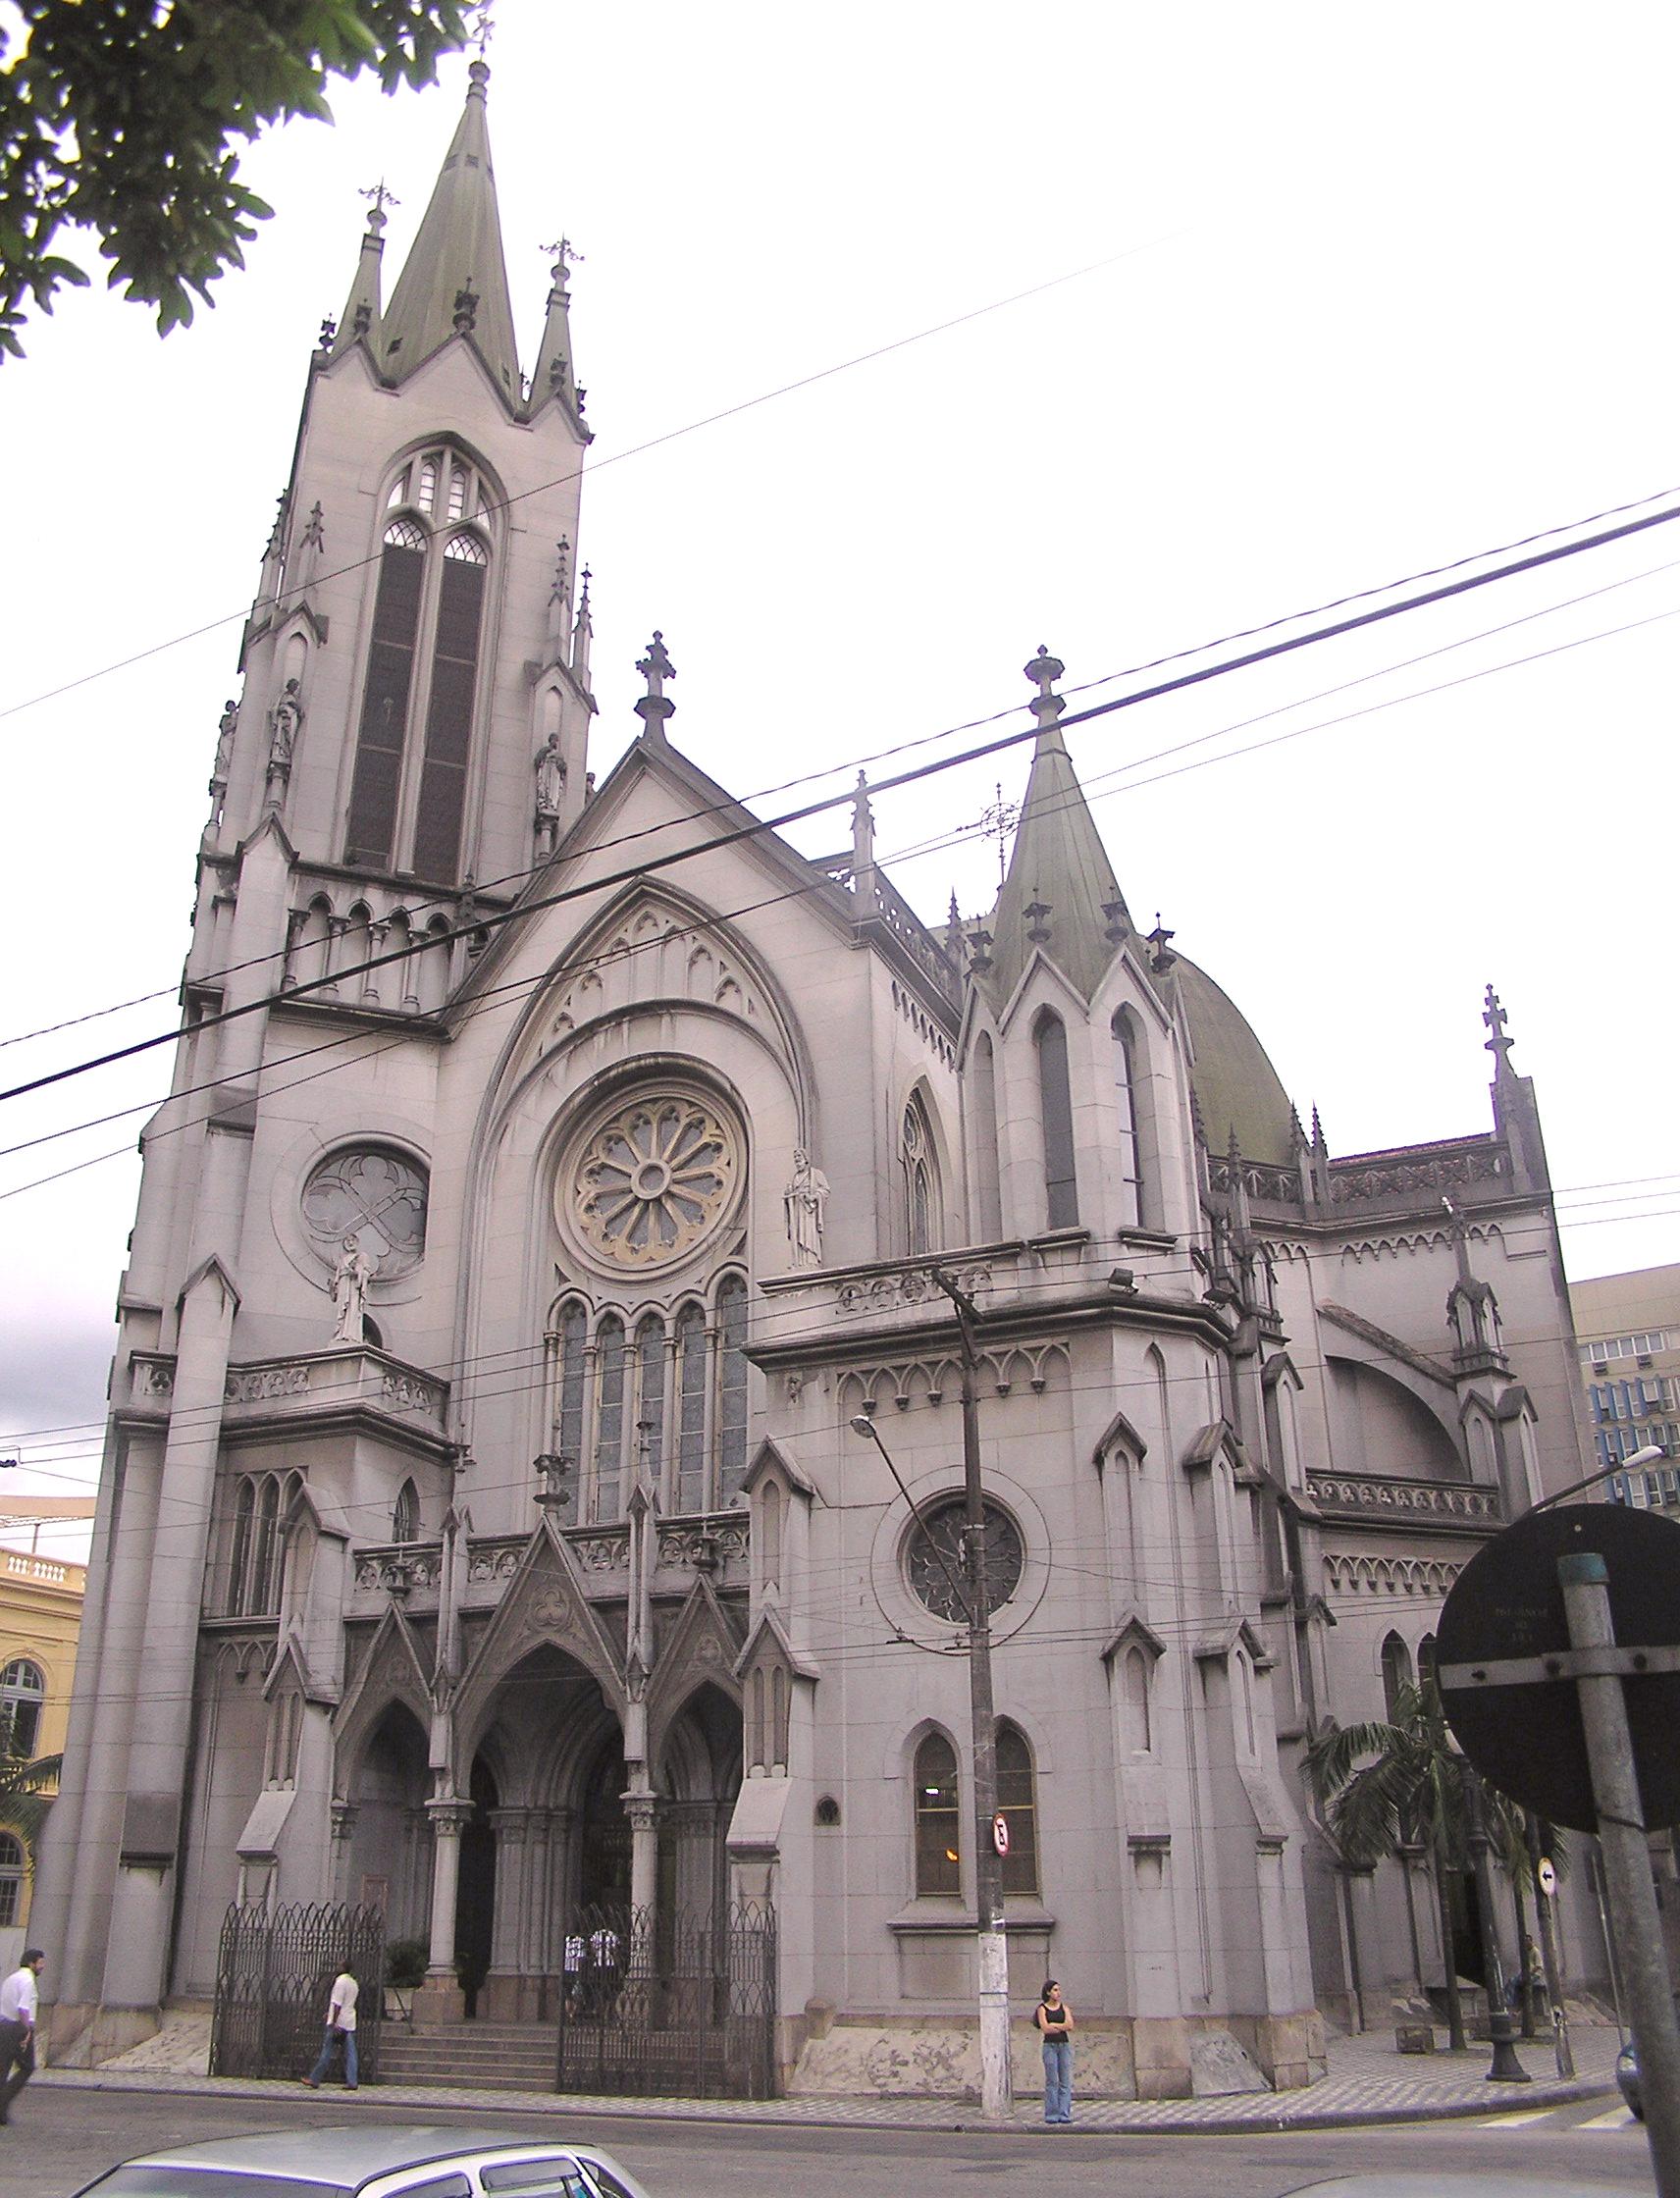 Depiction of Catedral de Santos